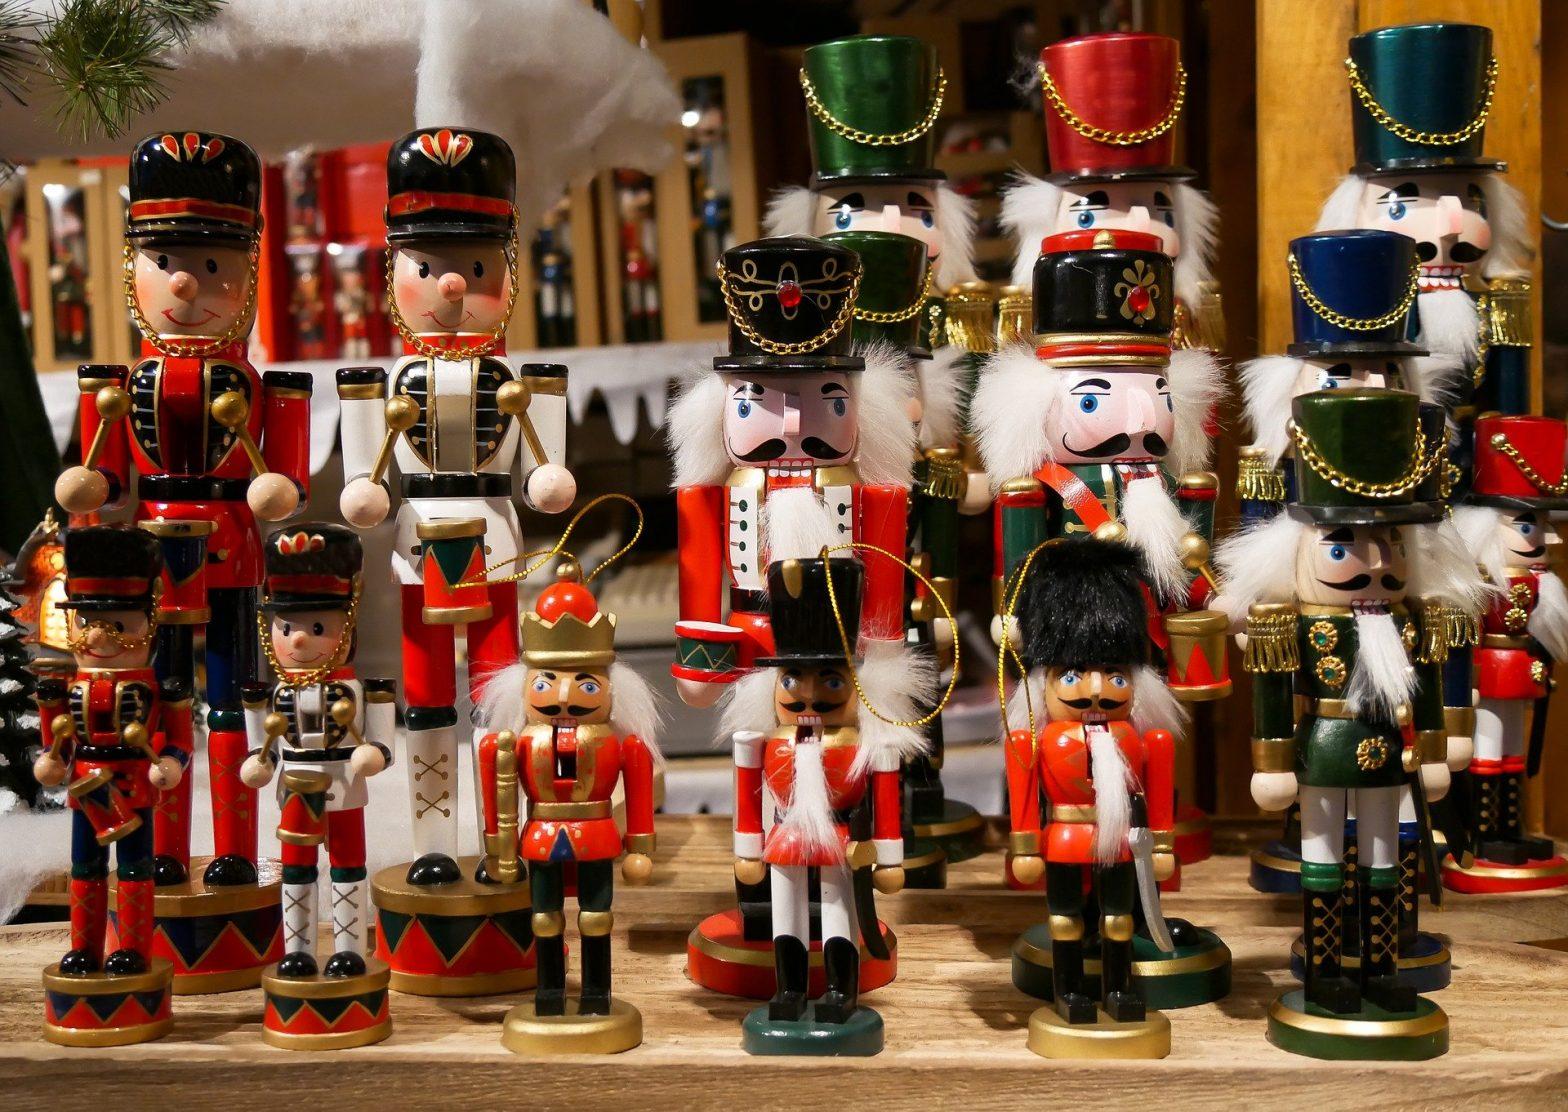 Christmas in EYFS: The Nutcracker